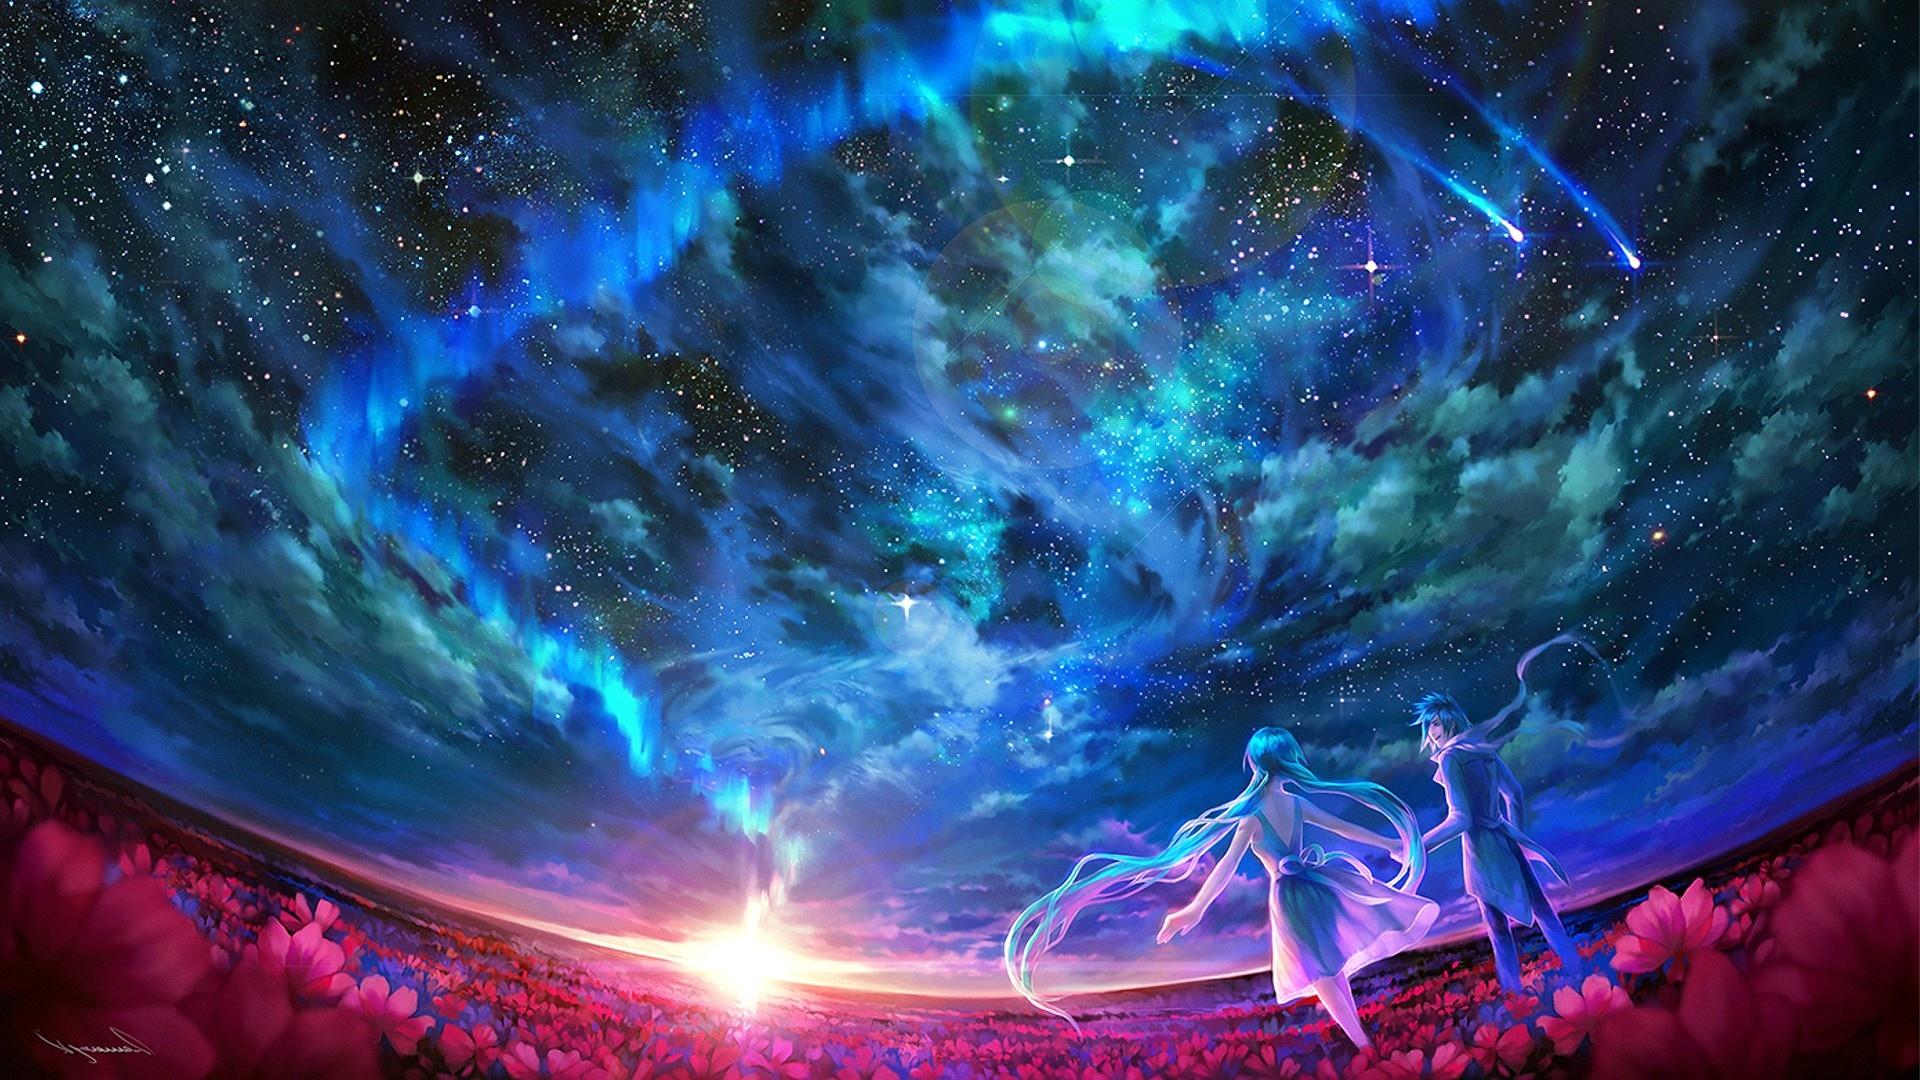 Anime-Vocaloid-Flower-Cloud-Sky-Landscape-Blue-Hair-Long-Hair-Sun-Star-Hatsune-Miku-Kaito-Vocaloid-wallpaper-wp3602567